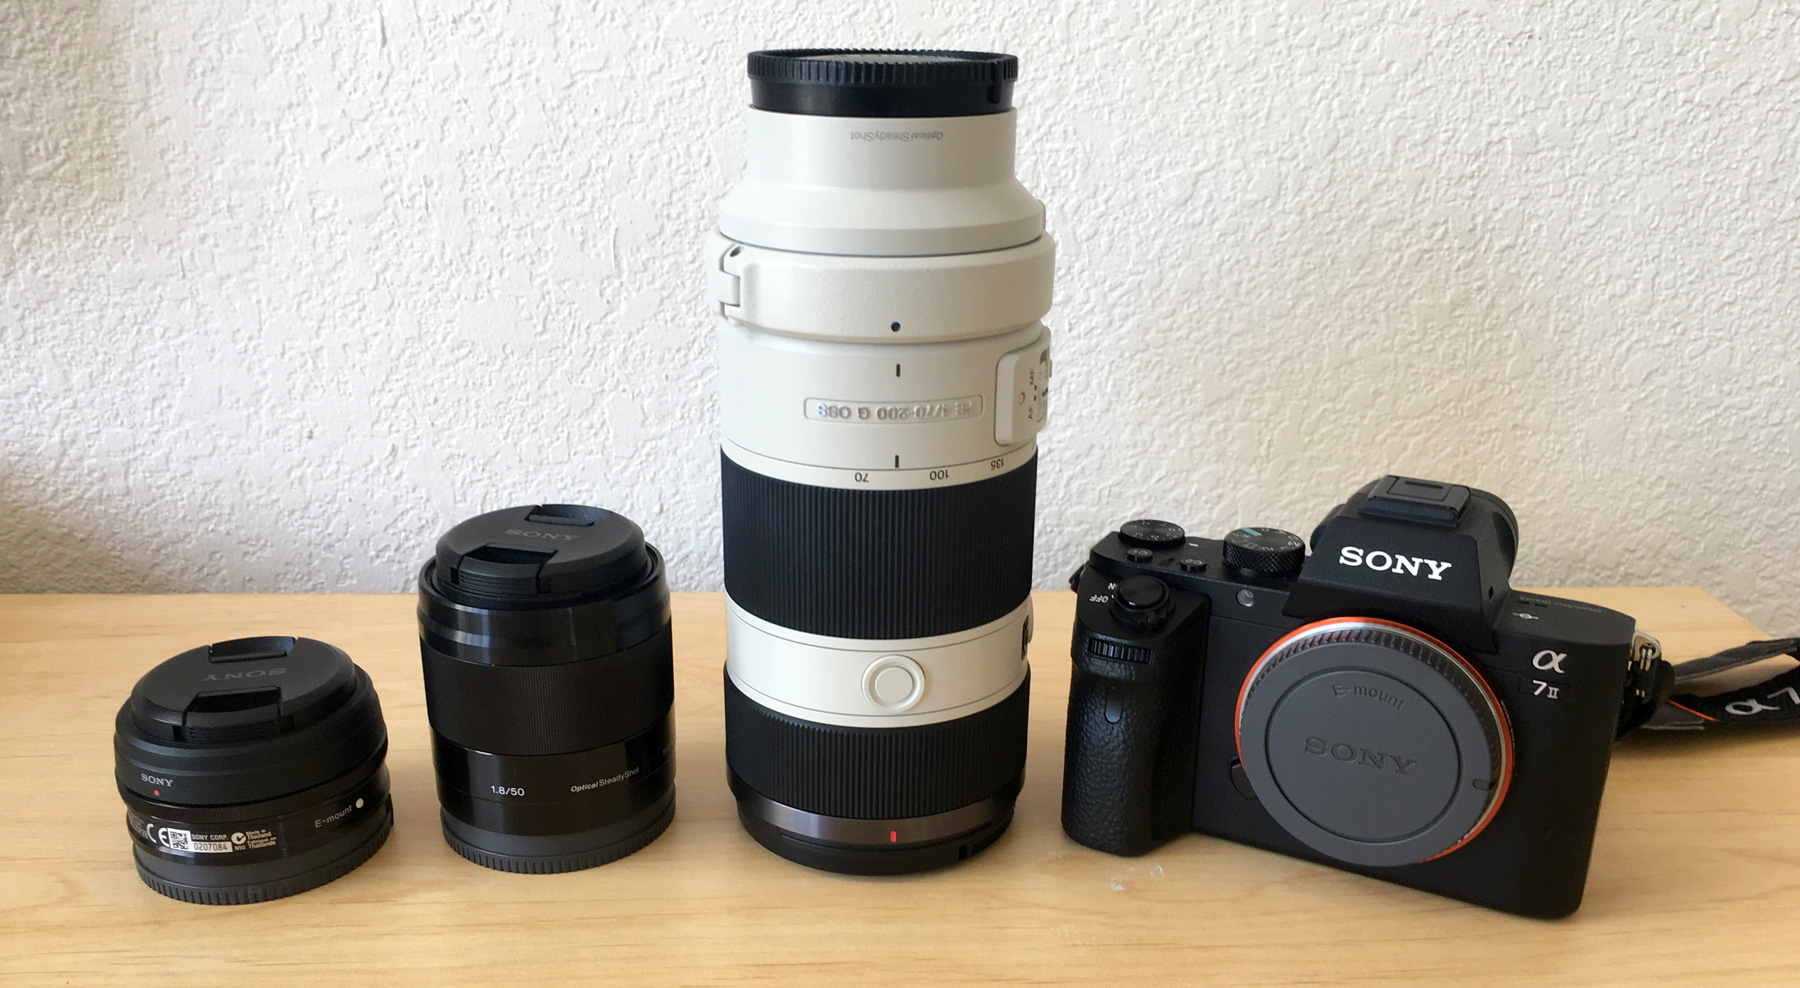 Sony A7II & Lenses